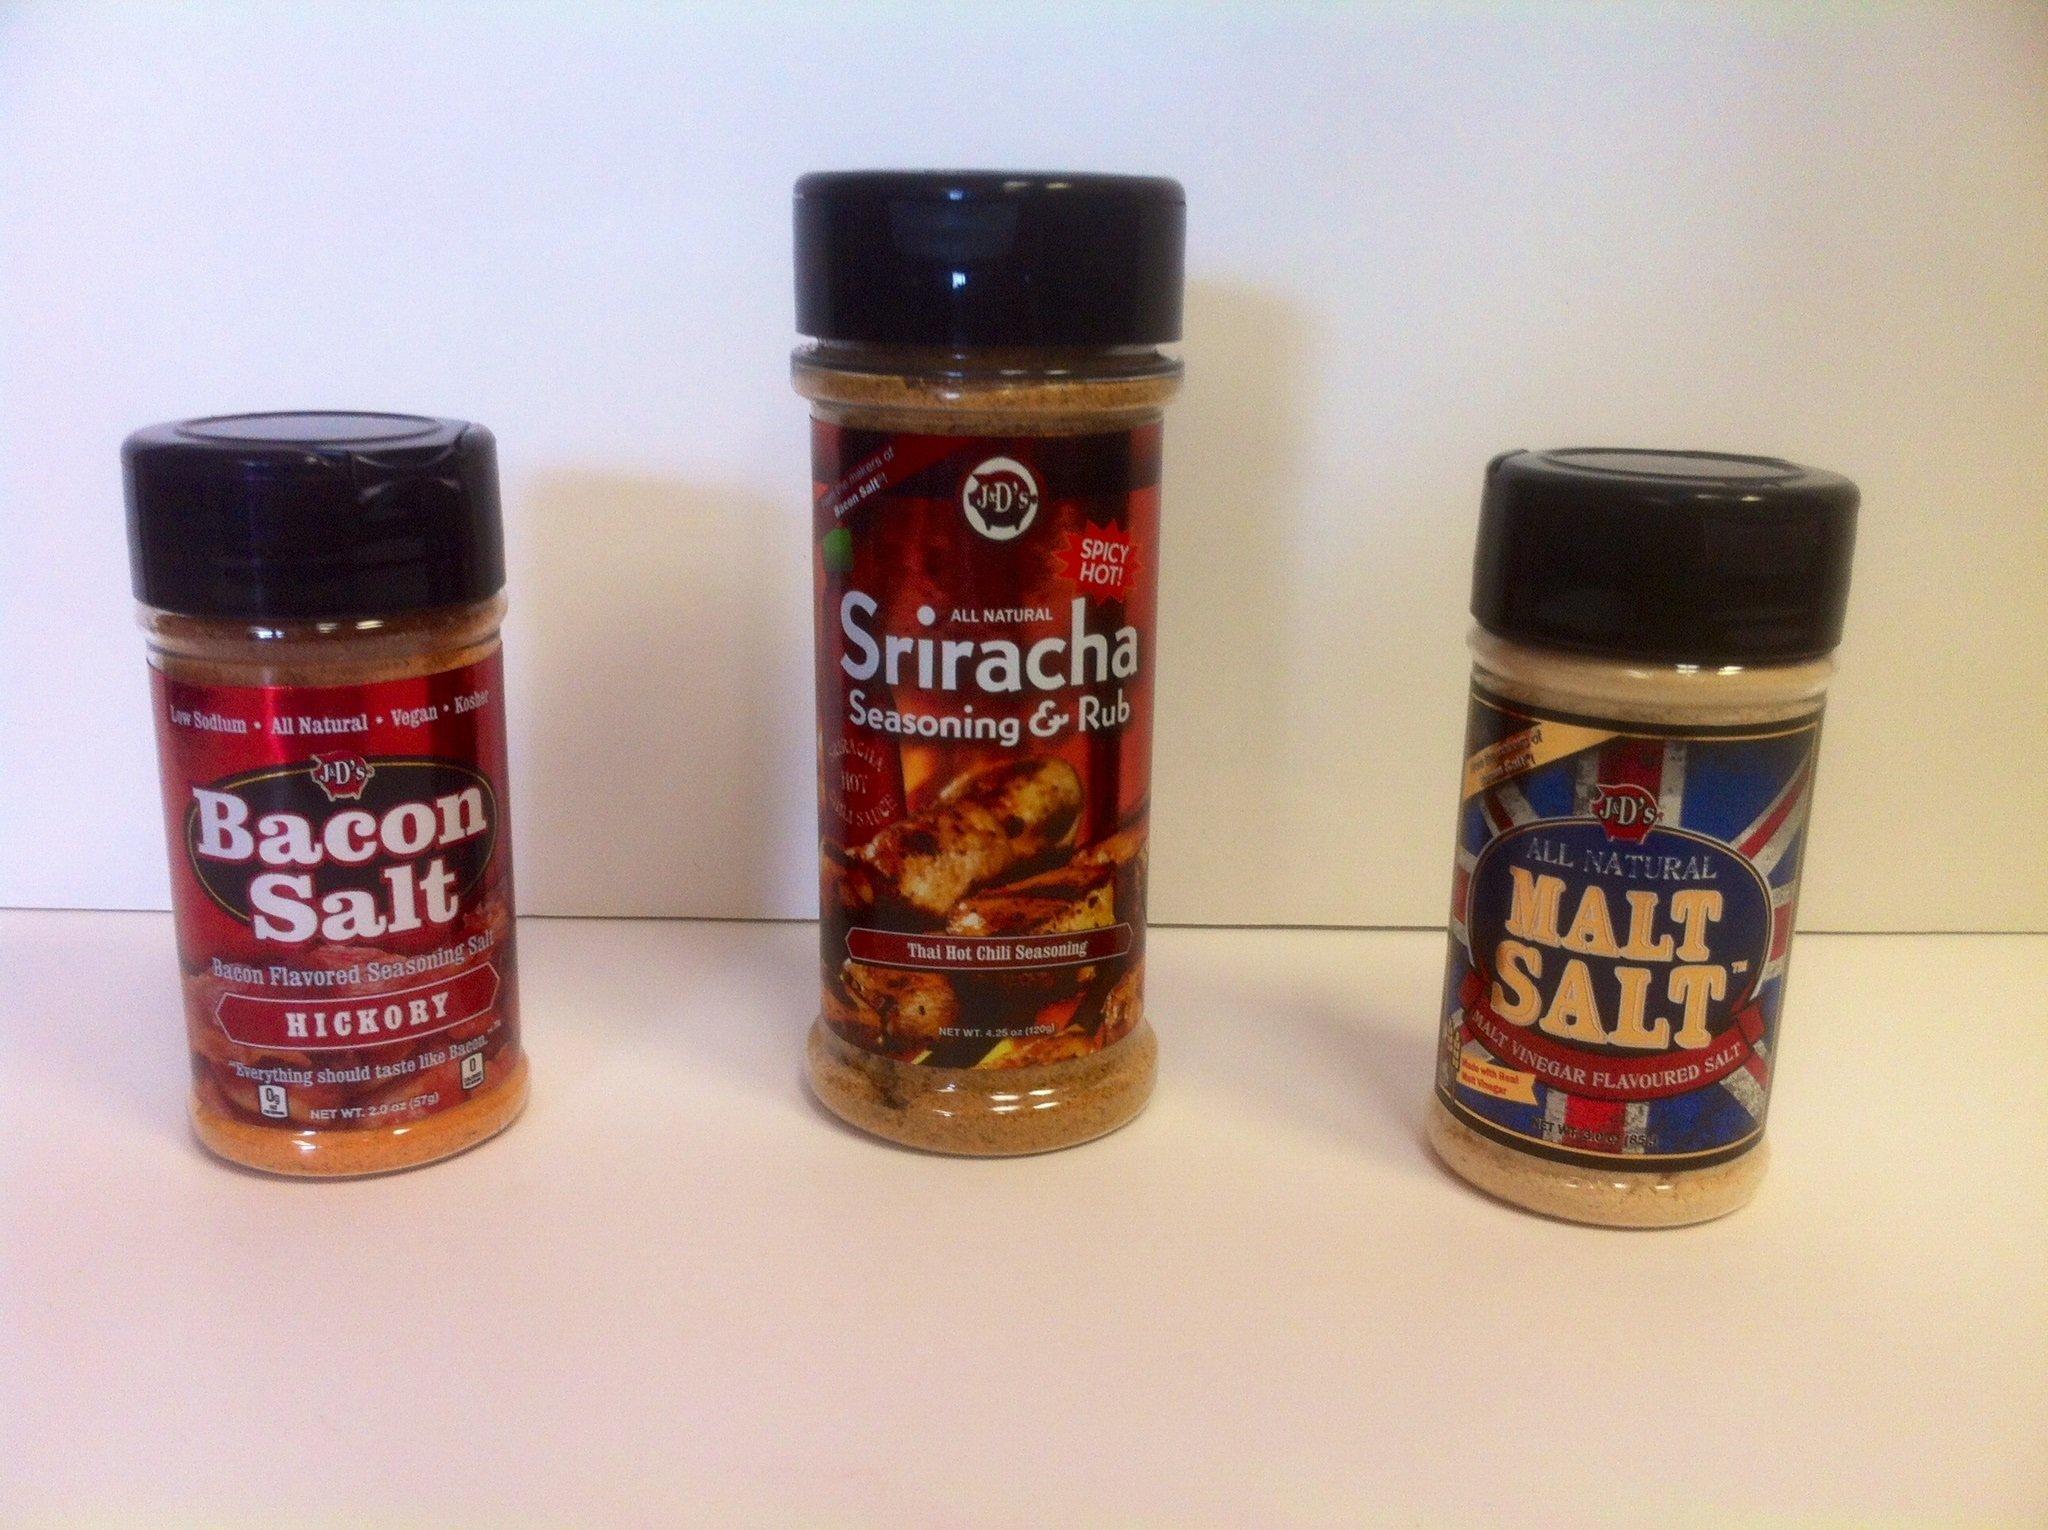 Exotic Gourmet Seasonings Triple Pack- Hickory Bacon Salt (2oz) Sriracha Rub (4.25oz) and Malt Salt (3oz)